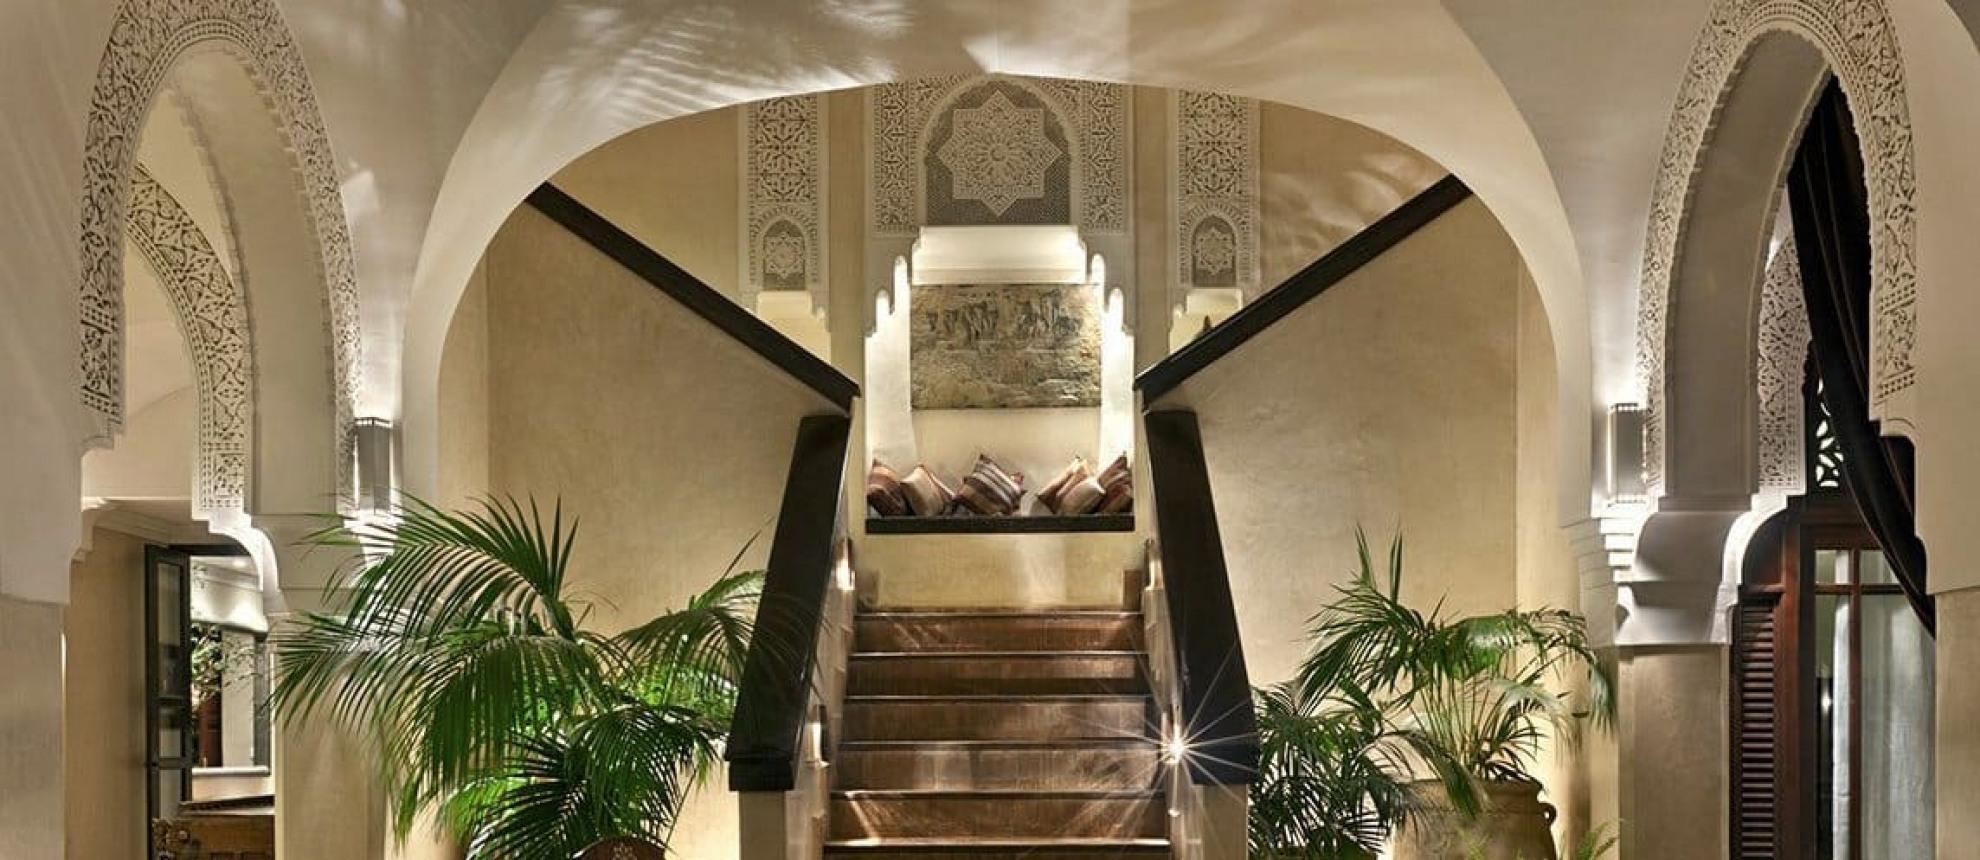 La villa des orangers marrakesch marokko green golf for La villa des orangers